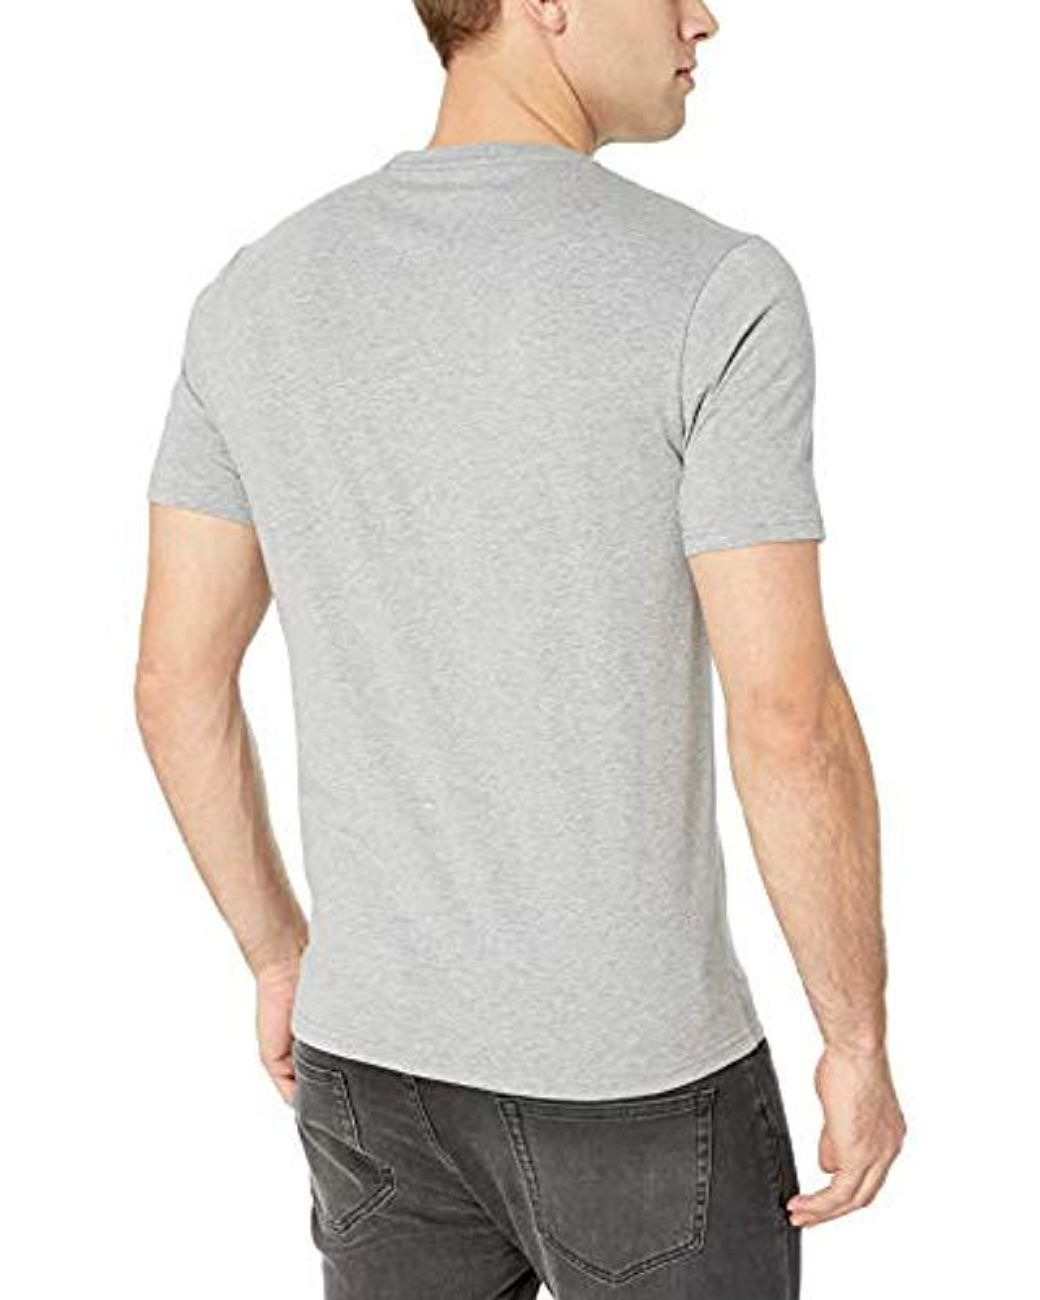 Essentials Mens 2-pack Slim-fit Short-sleeve Crewneck T-shirt Short Sleeve T-Shirt